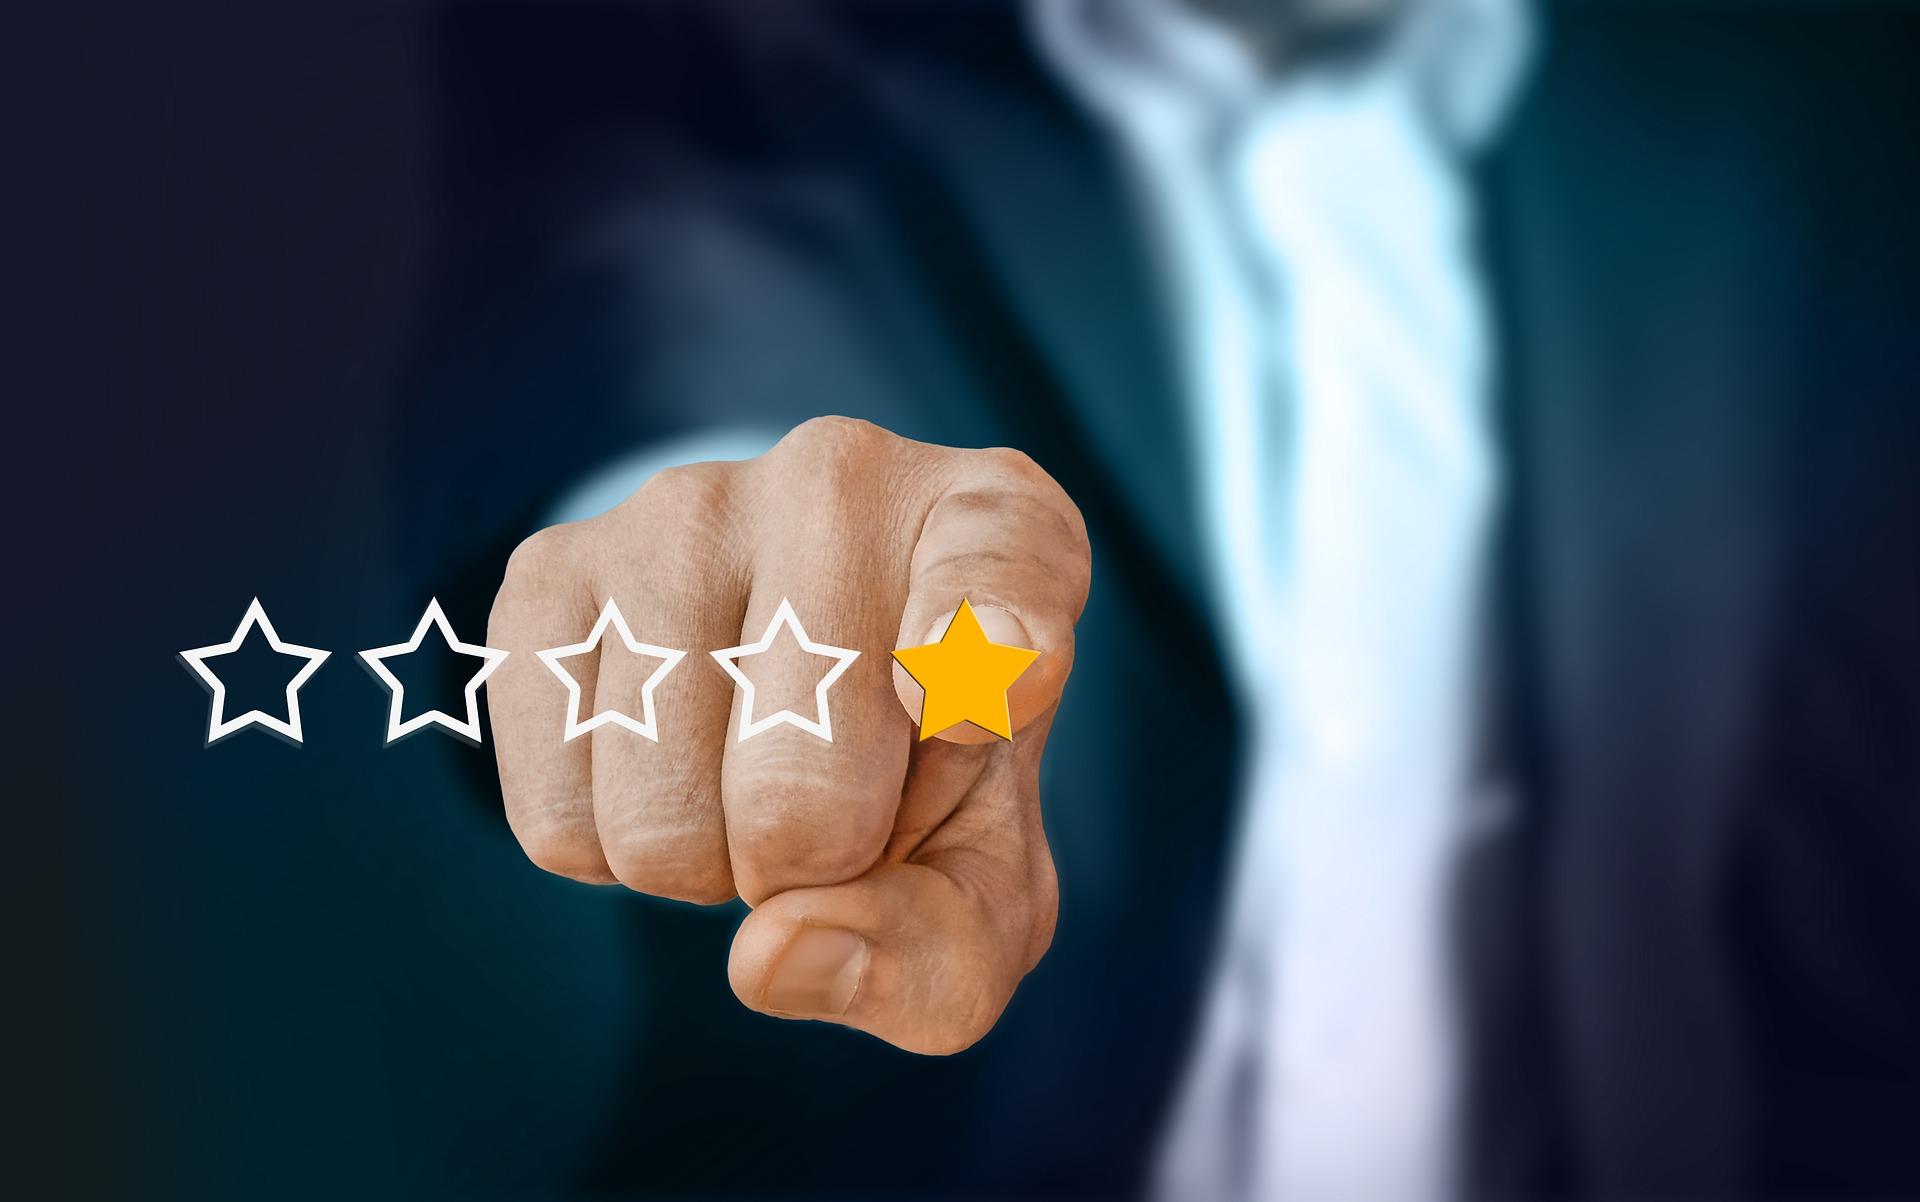 Is Gostores Shop an Untrustworthy Online Store?